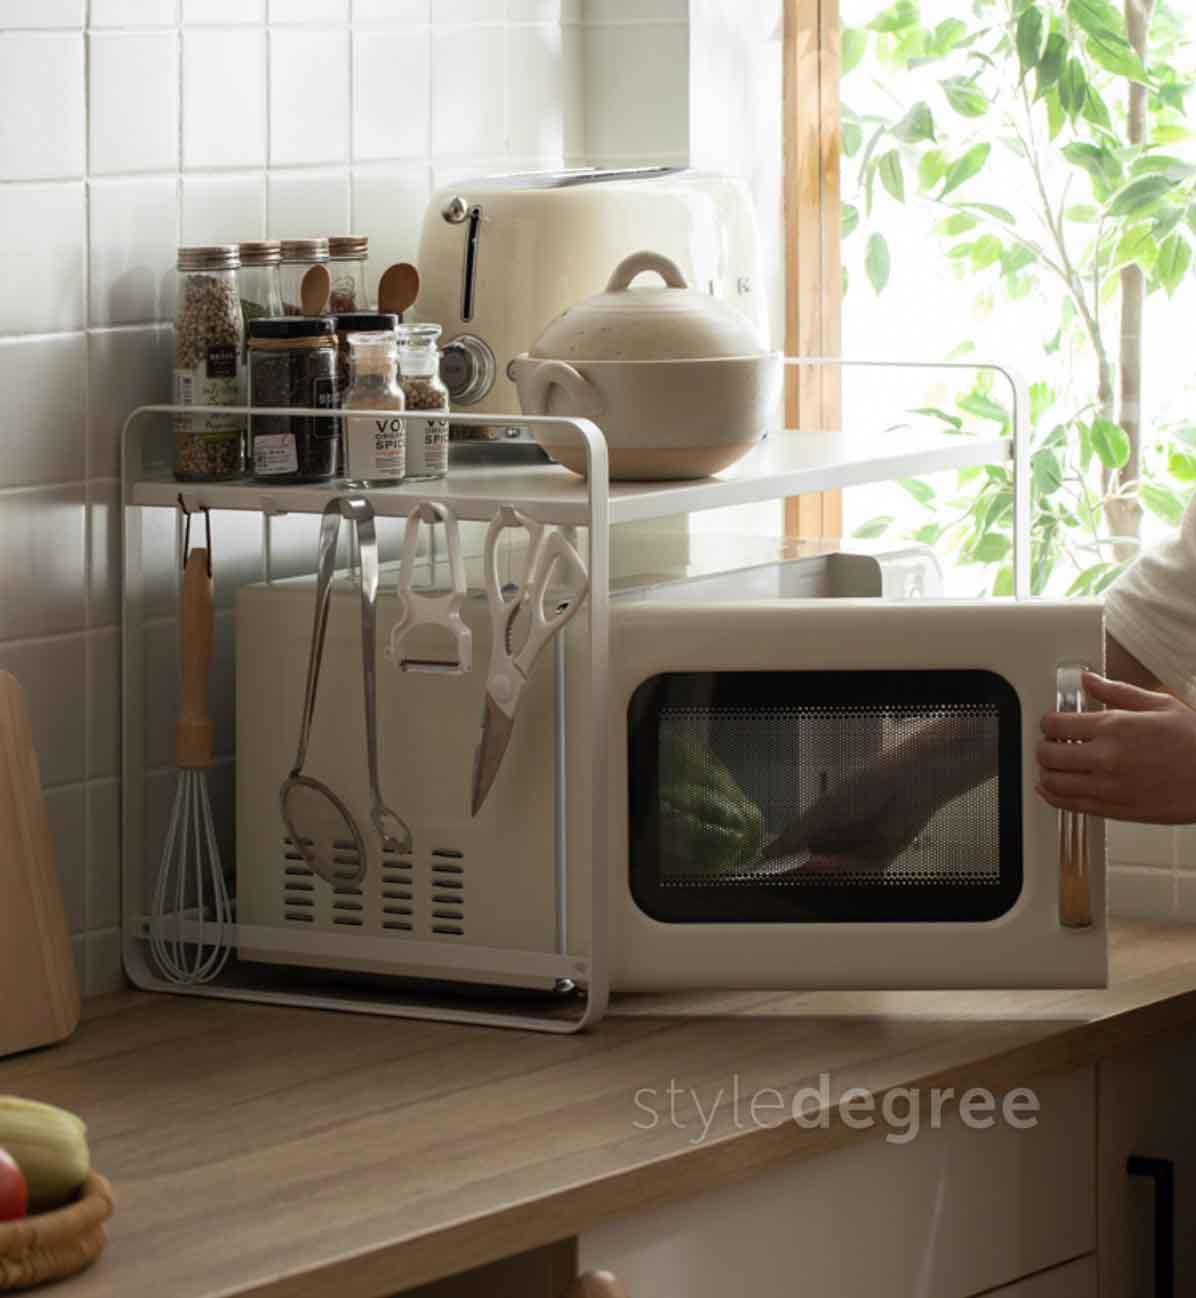 2 Tier Microwave Kitchen Rack Storage Maximise Space